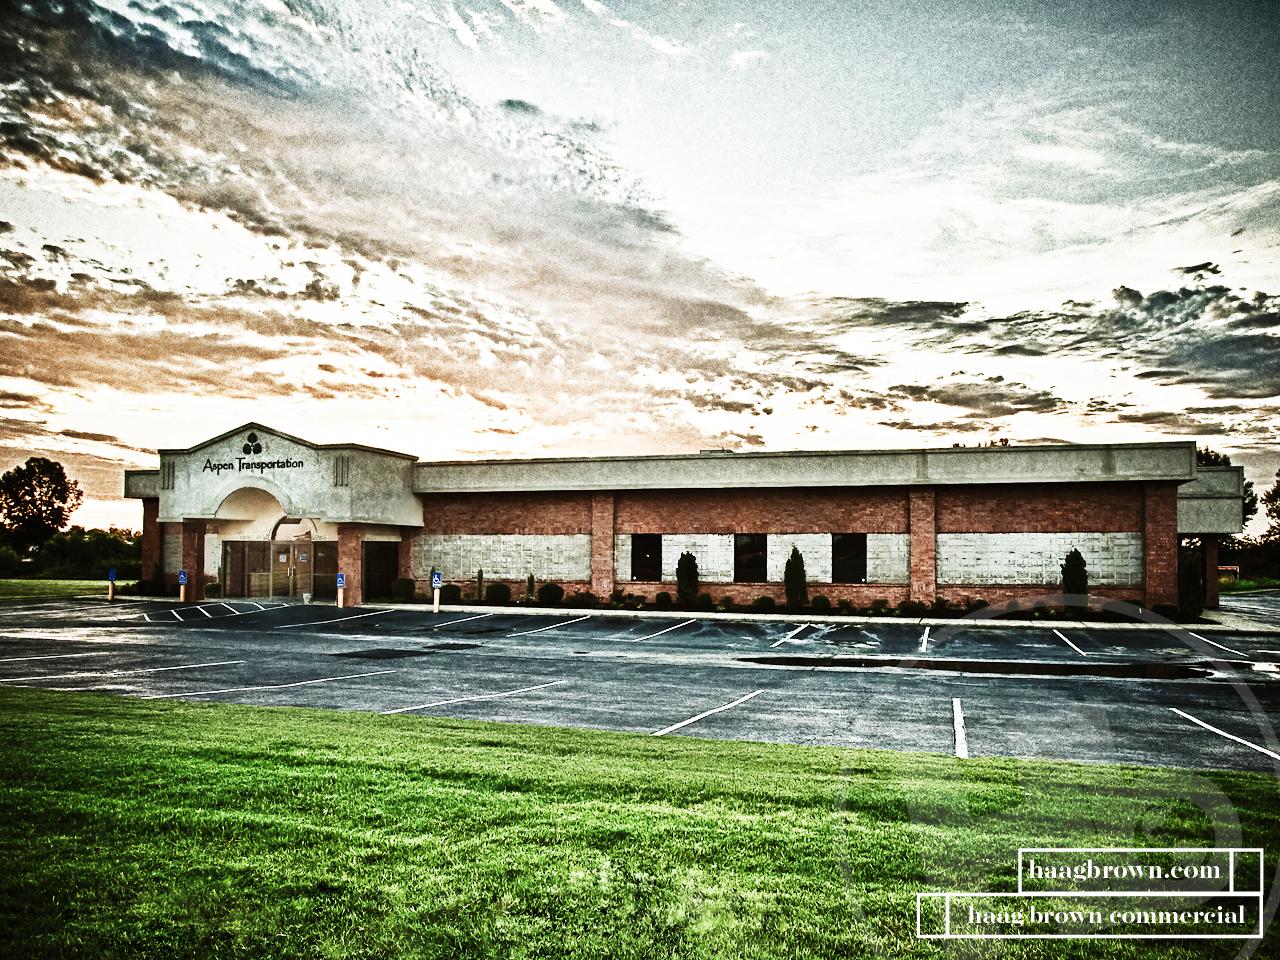 Aspen Transportation in Jonesboro, AR